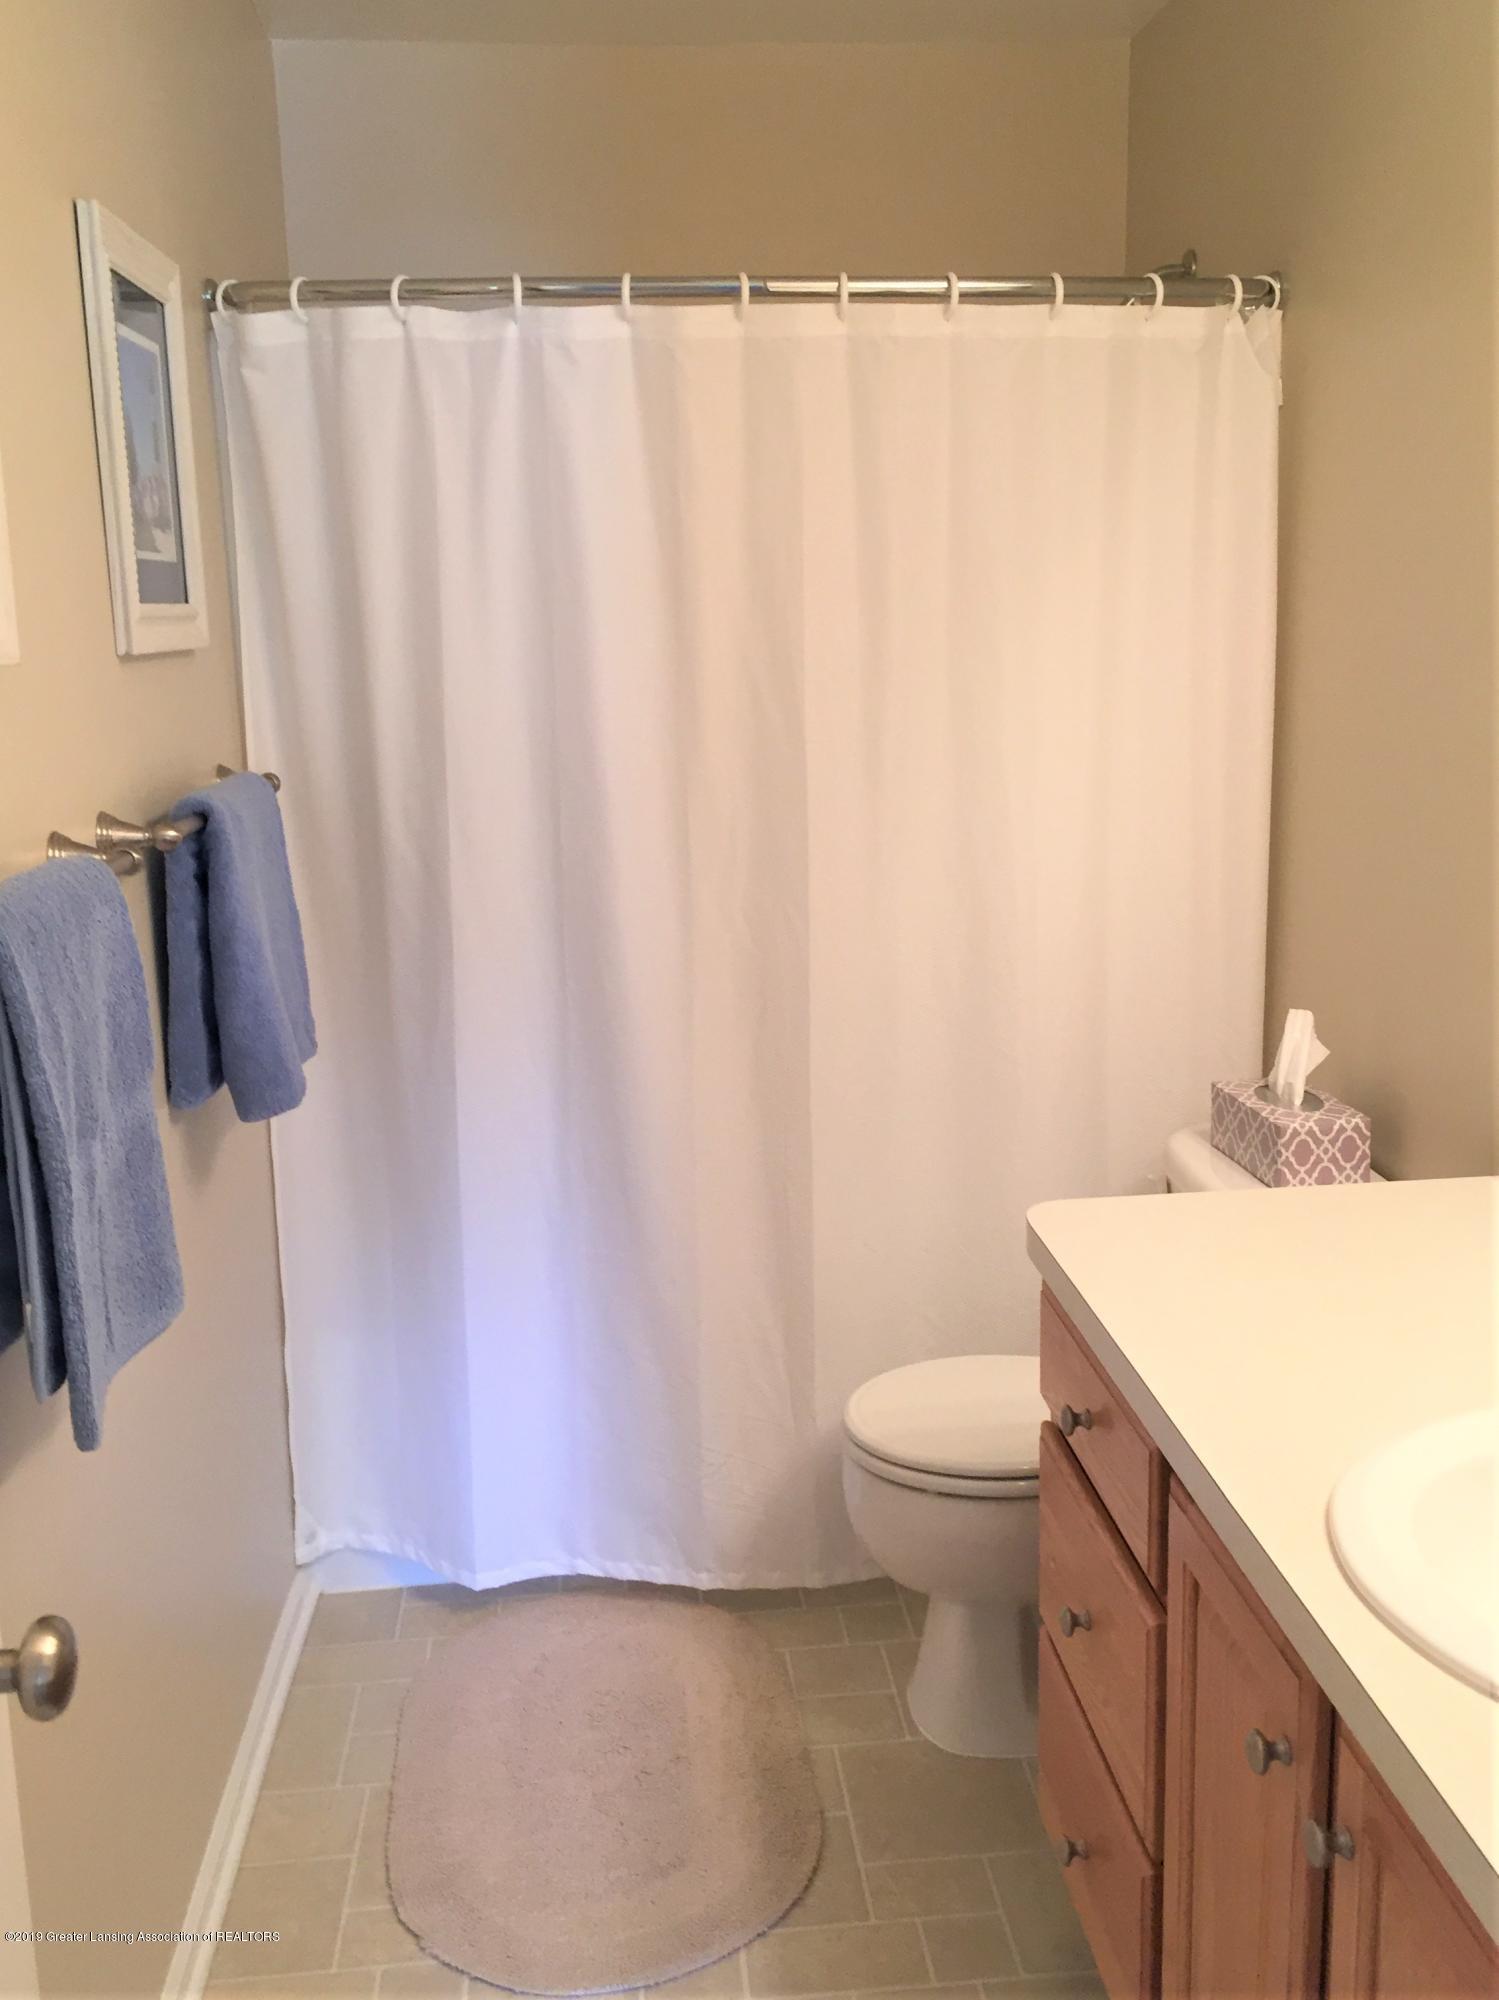 8617 Wheatdale Dr - Upstairs Bathroom - 38